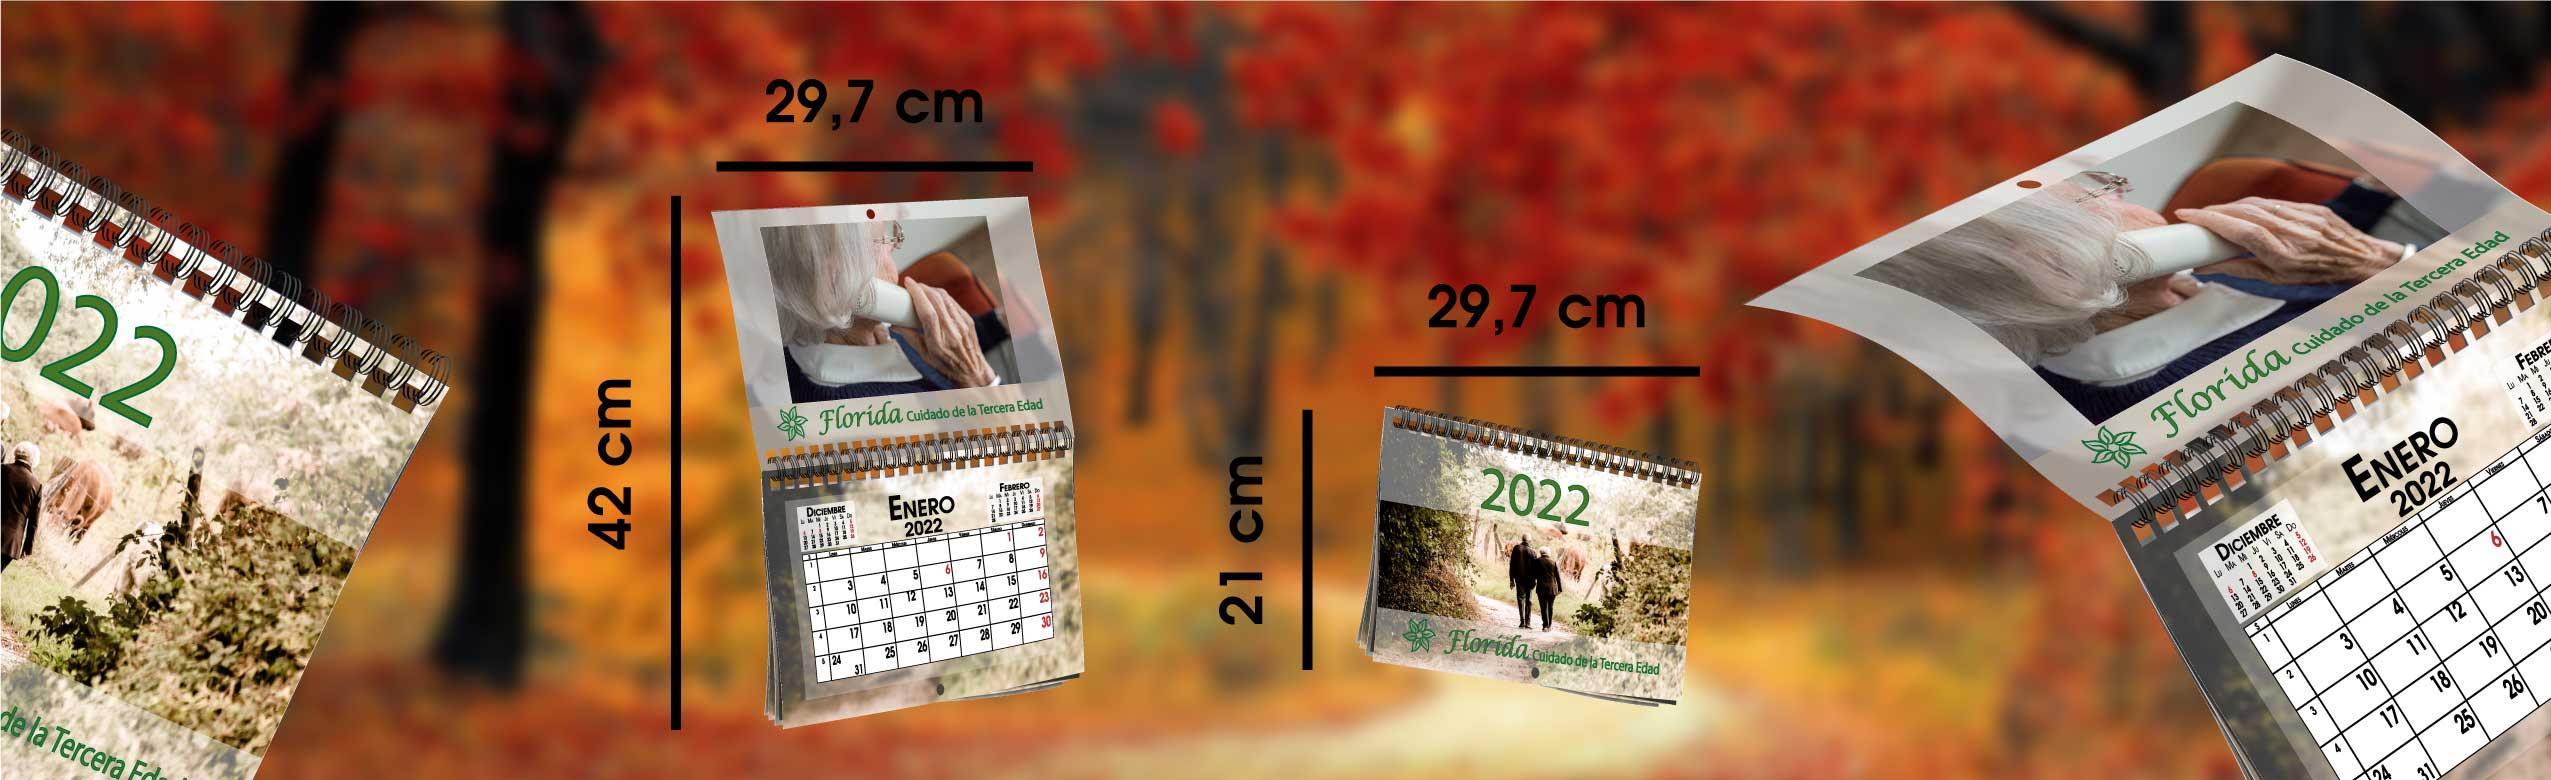 Calendario personalizado tipo revista